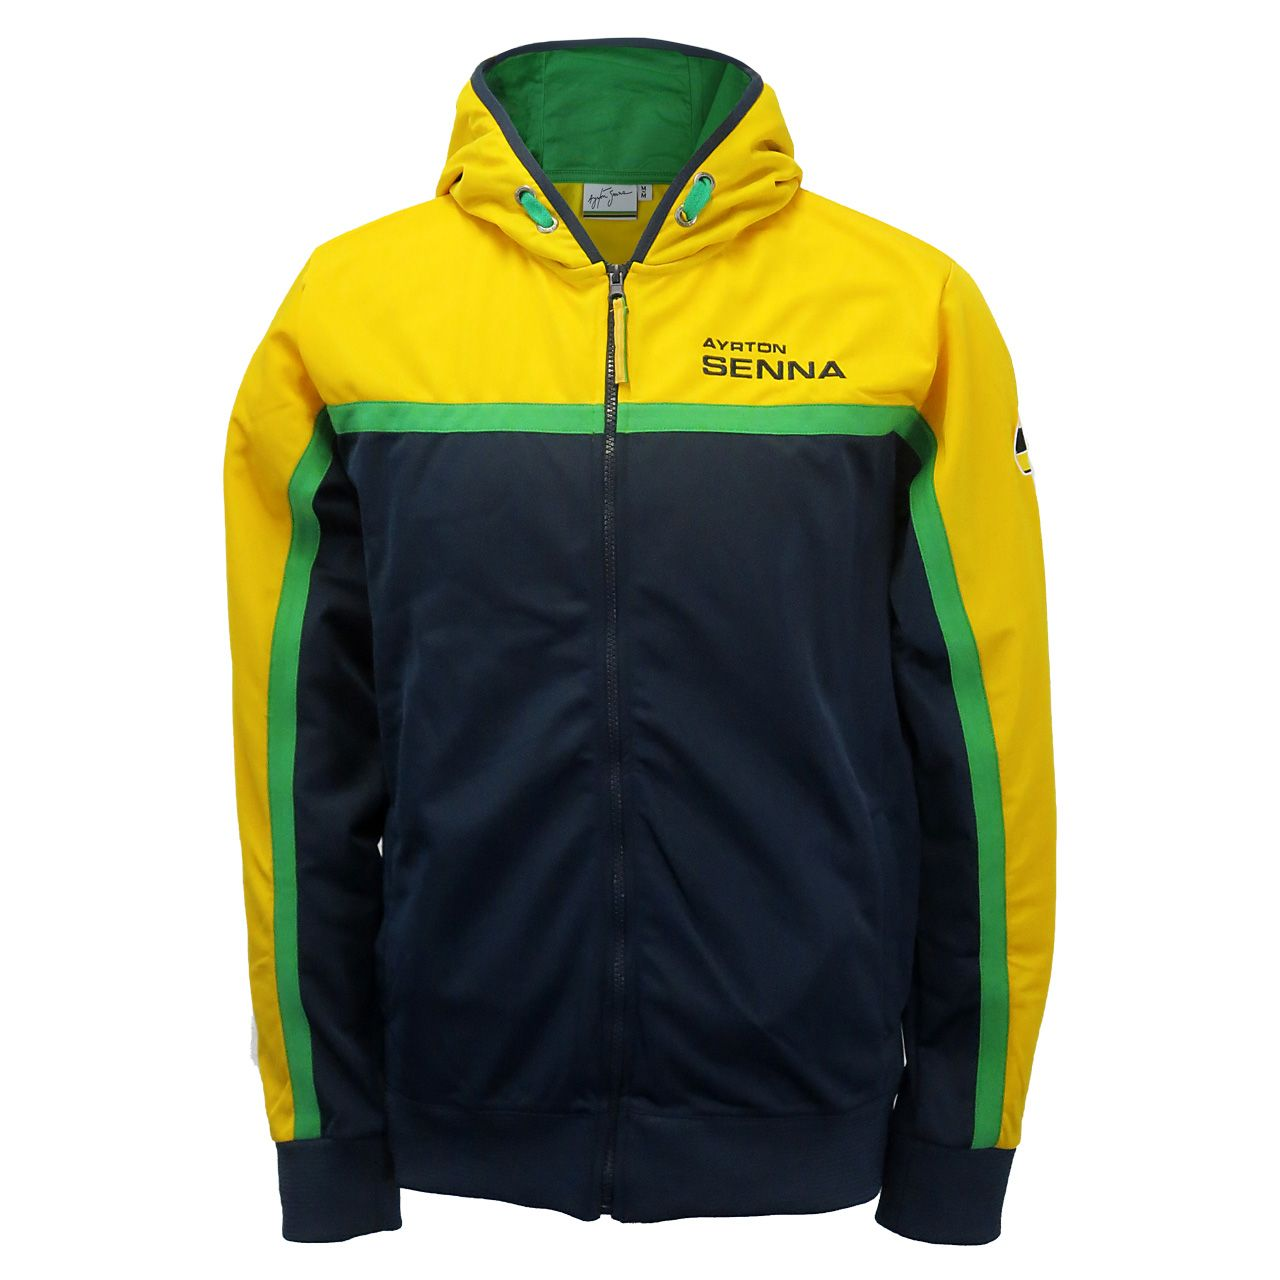 Ayrton Senna Zip Hoody Racing Merchandise